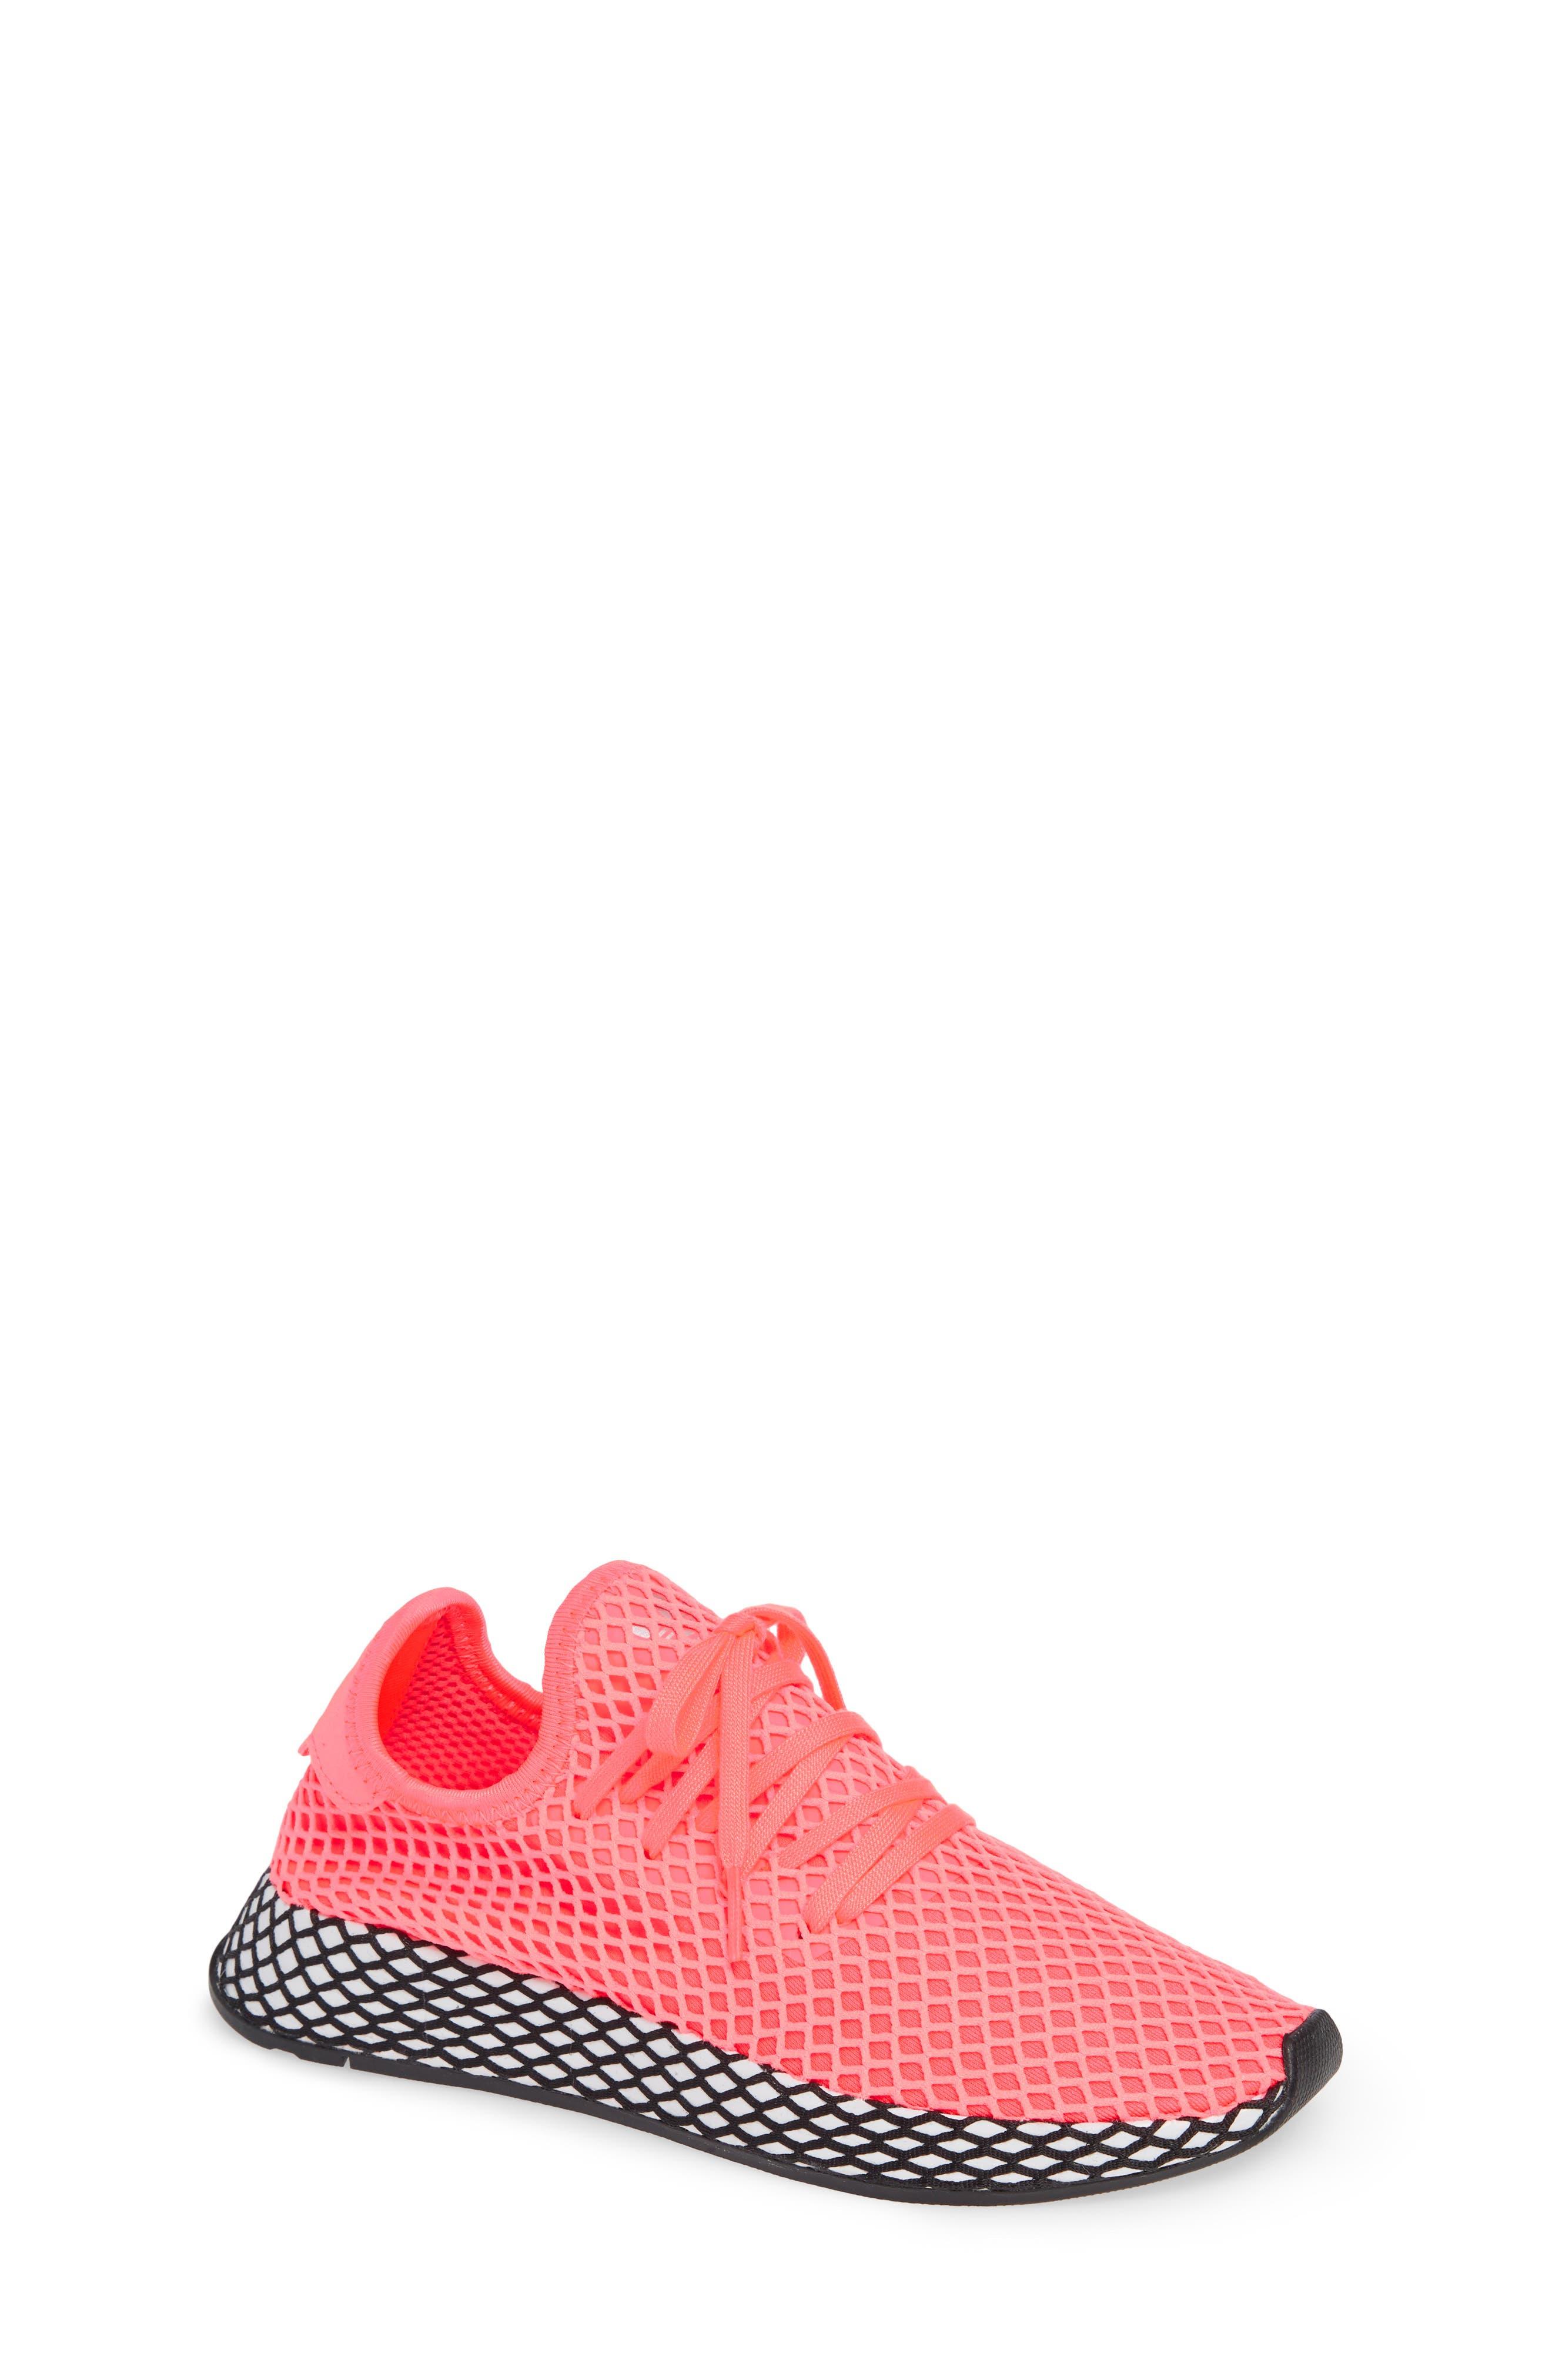 Deerupt Runner Sneaker,                         Main,                         color, TURBO/ TURBO/ BLACK